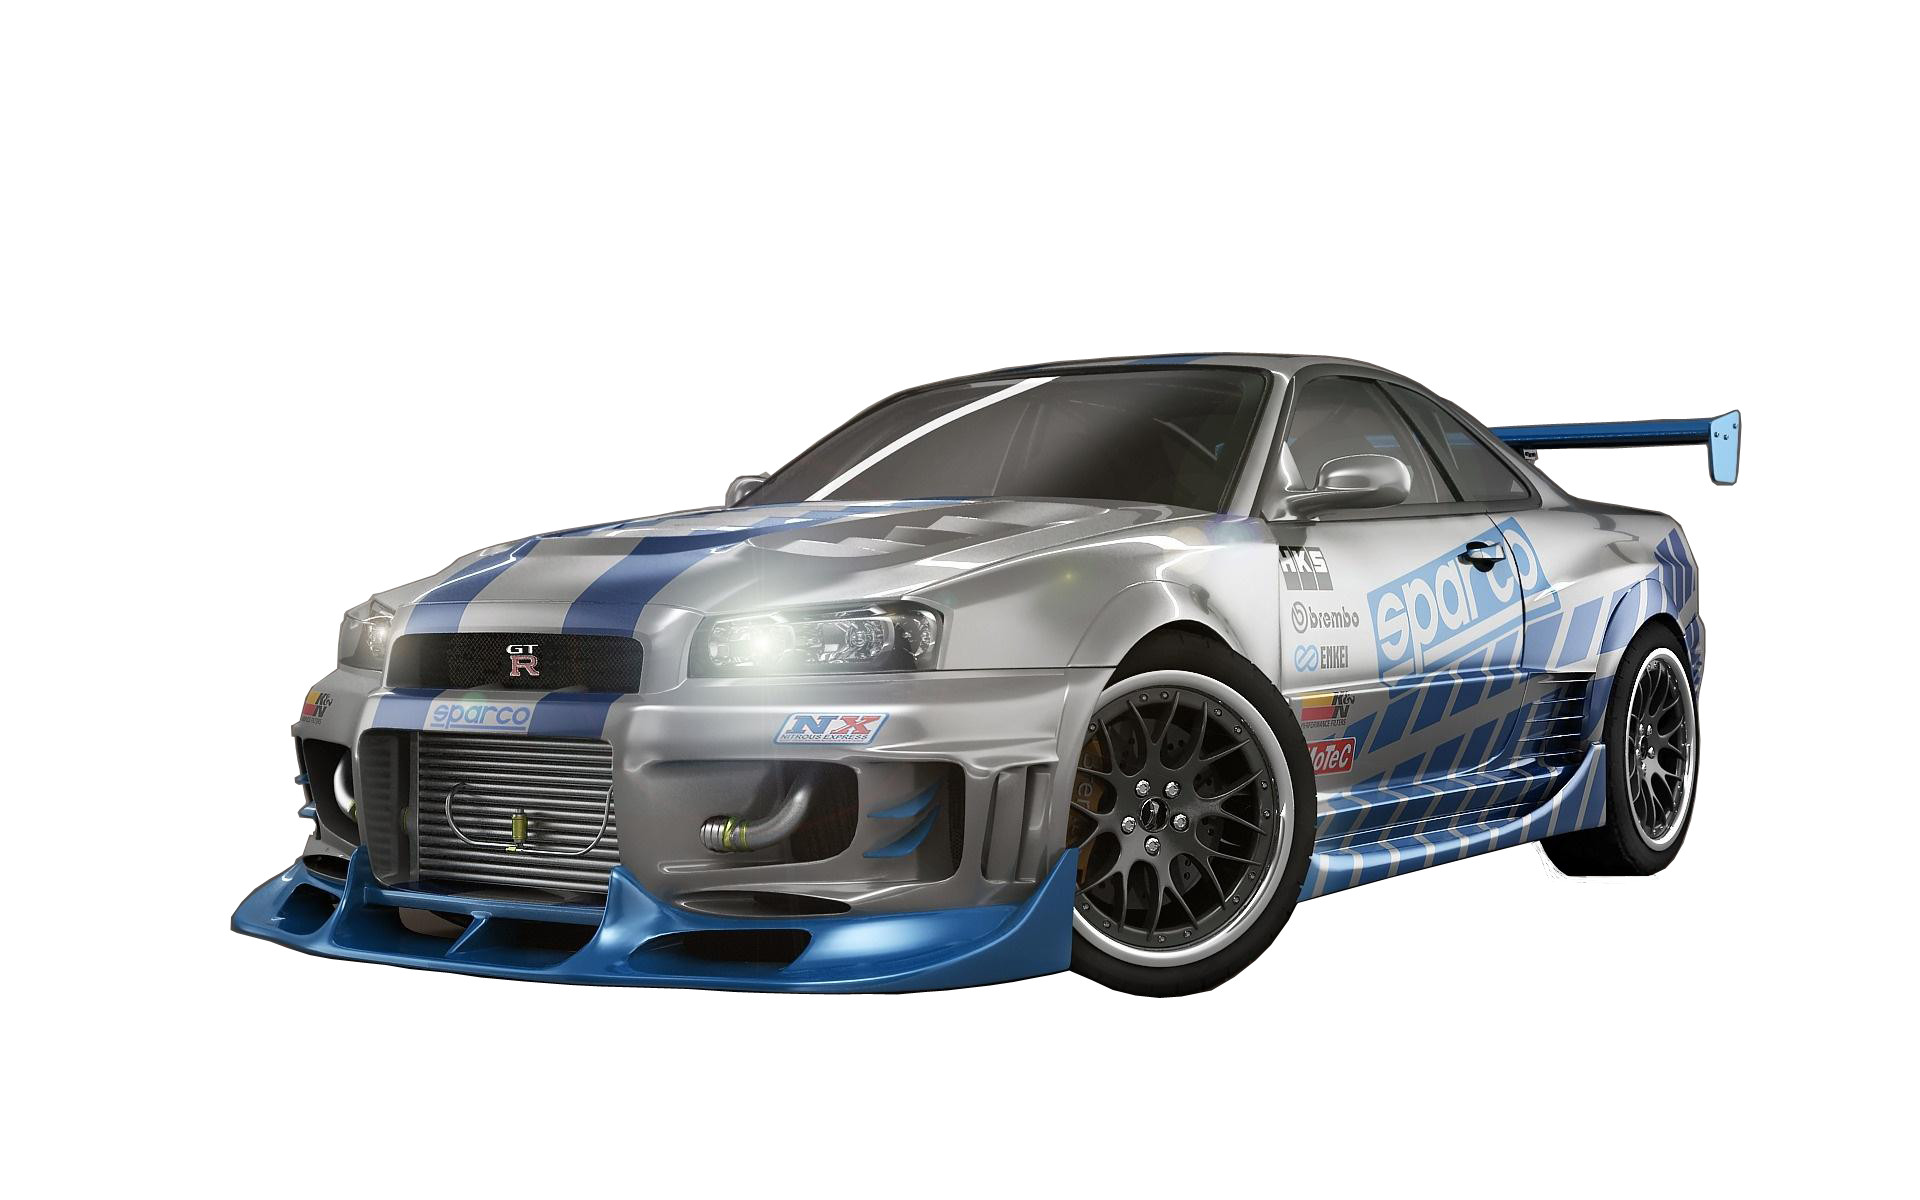 Nissan Skyline Fast and Furious 7 Sport Car Wallpaper